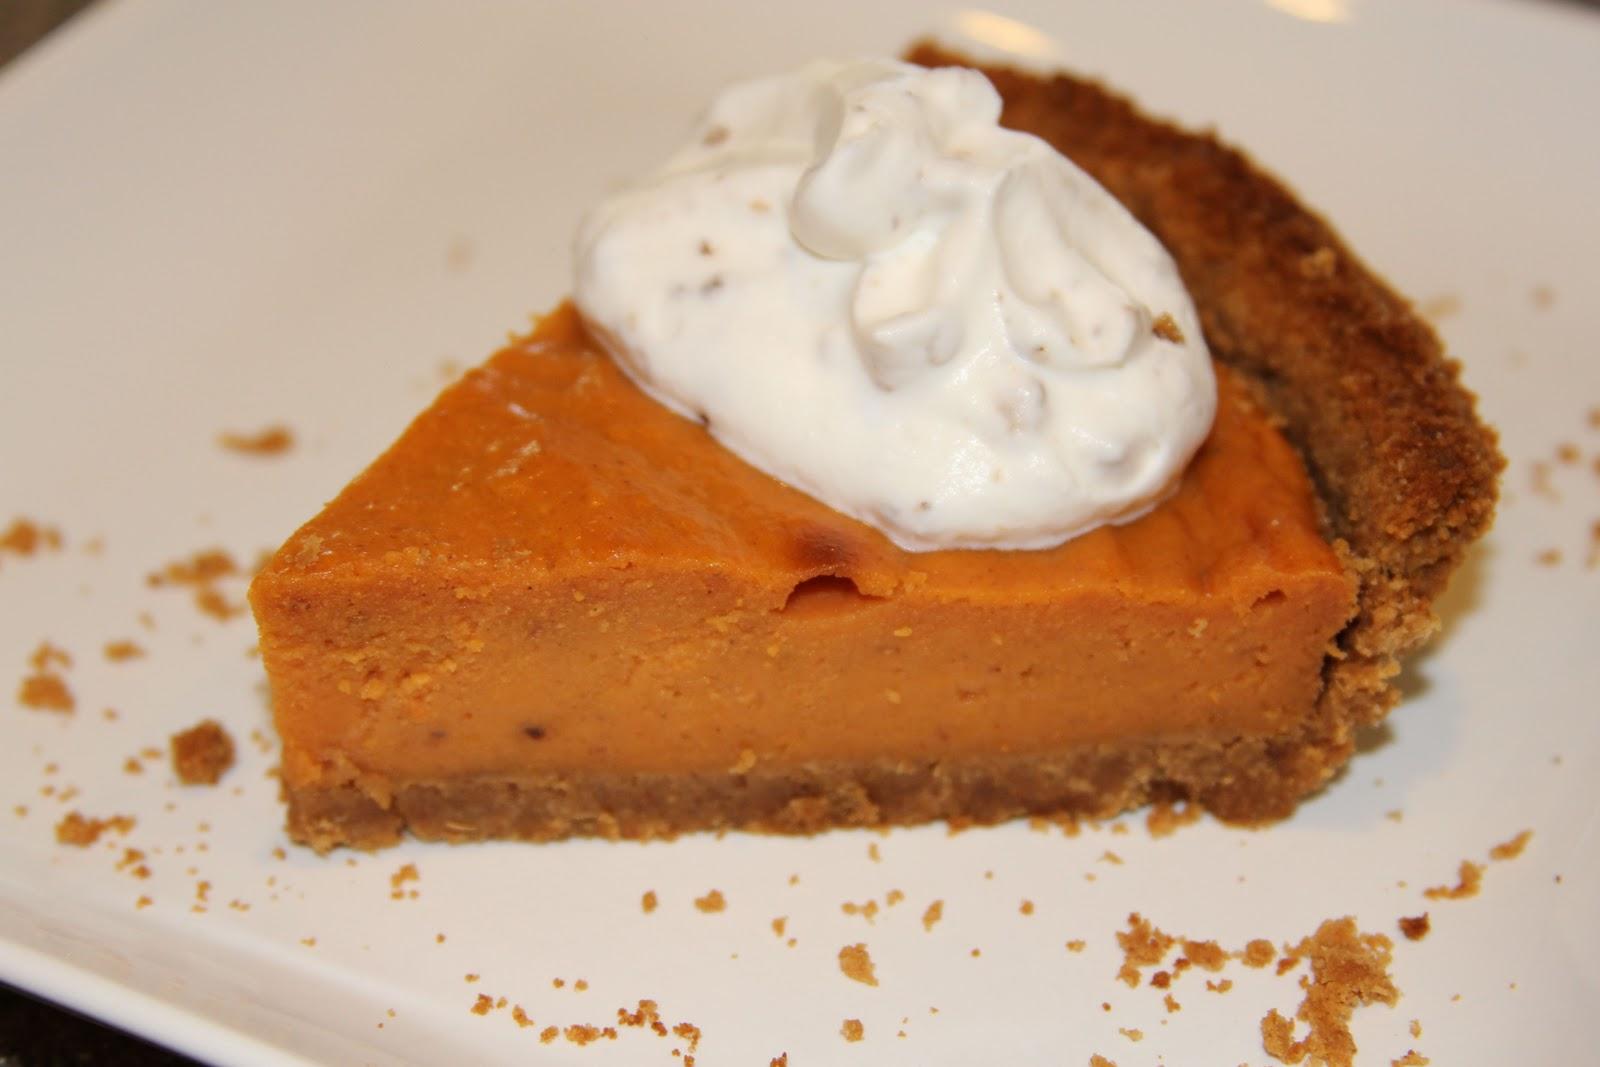 Sweet Potato Pie Fraction Math Arts And Craft